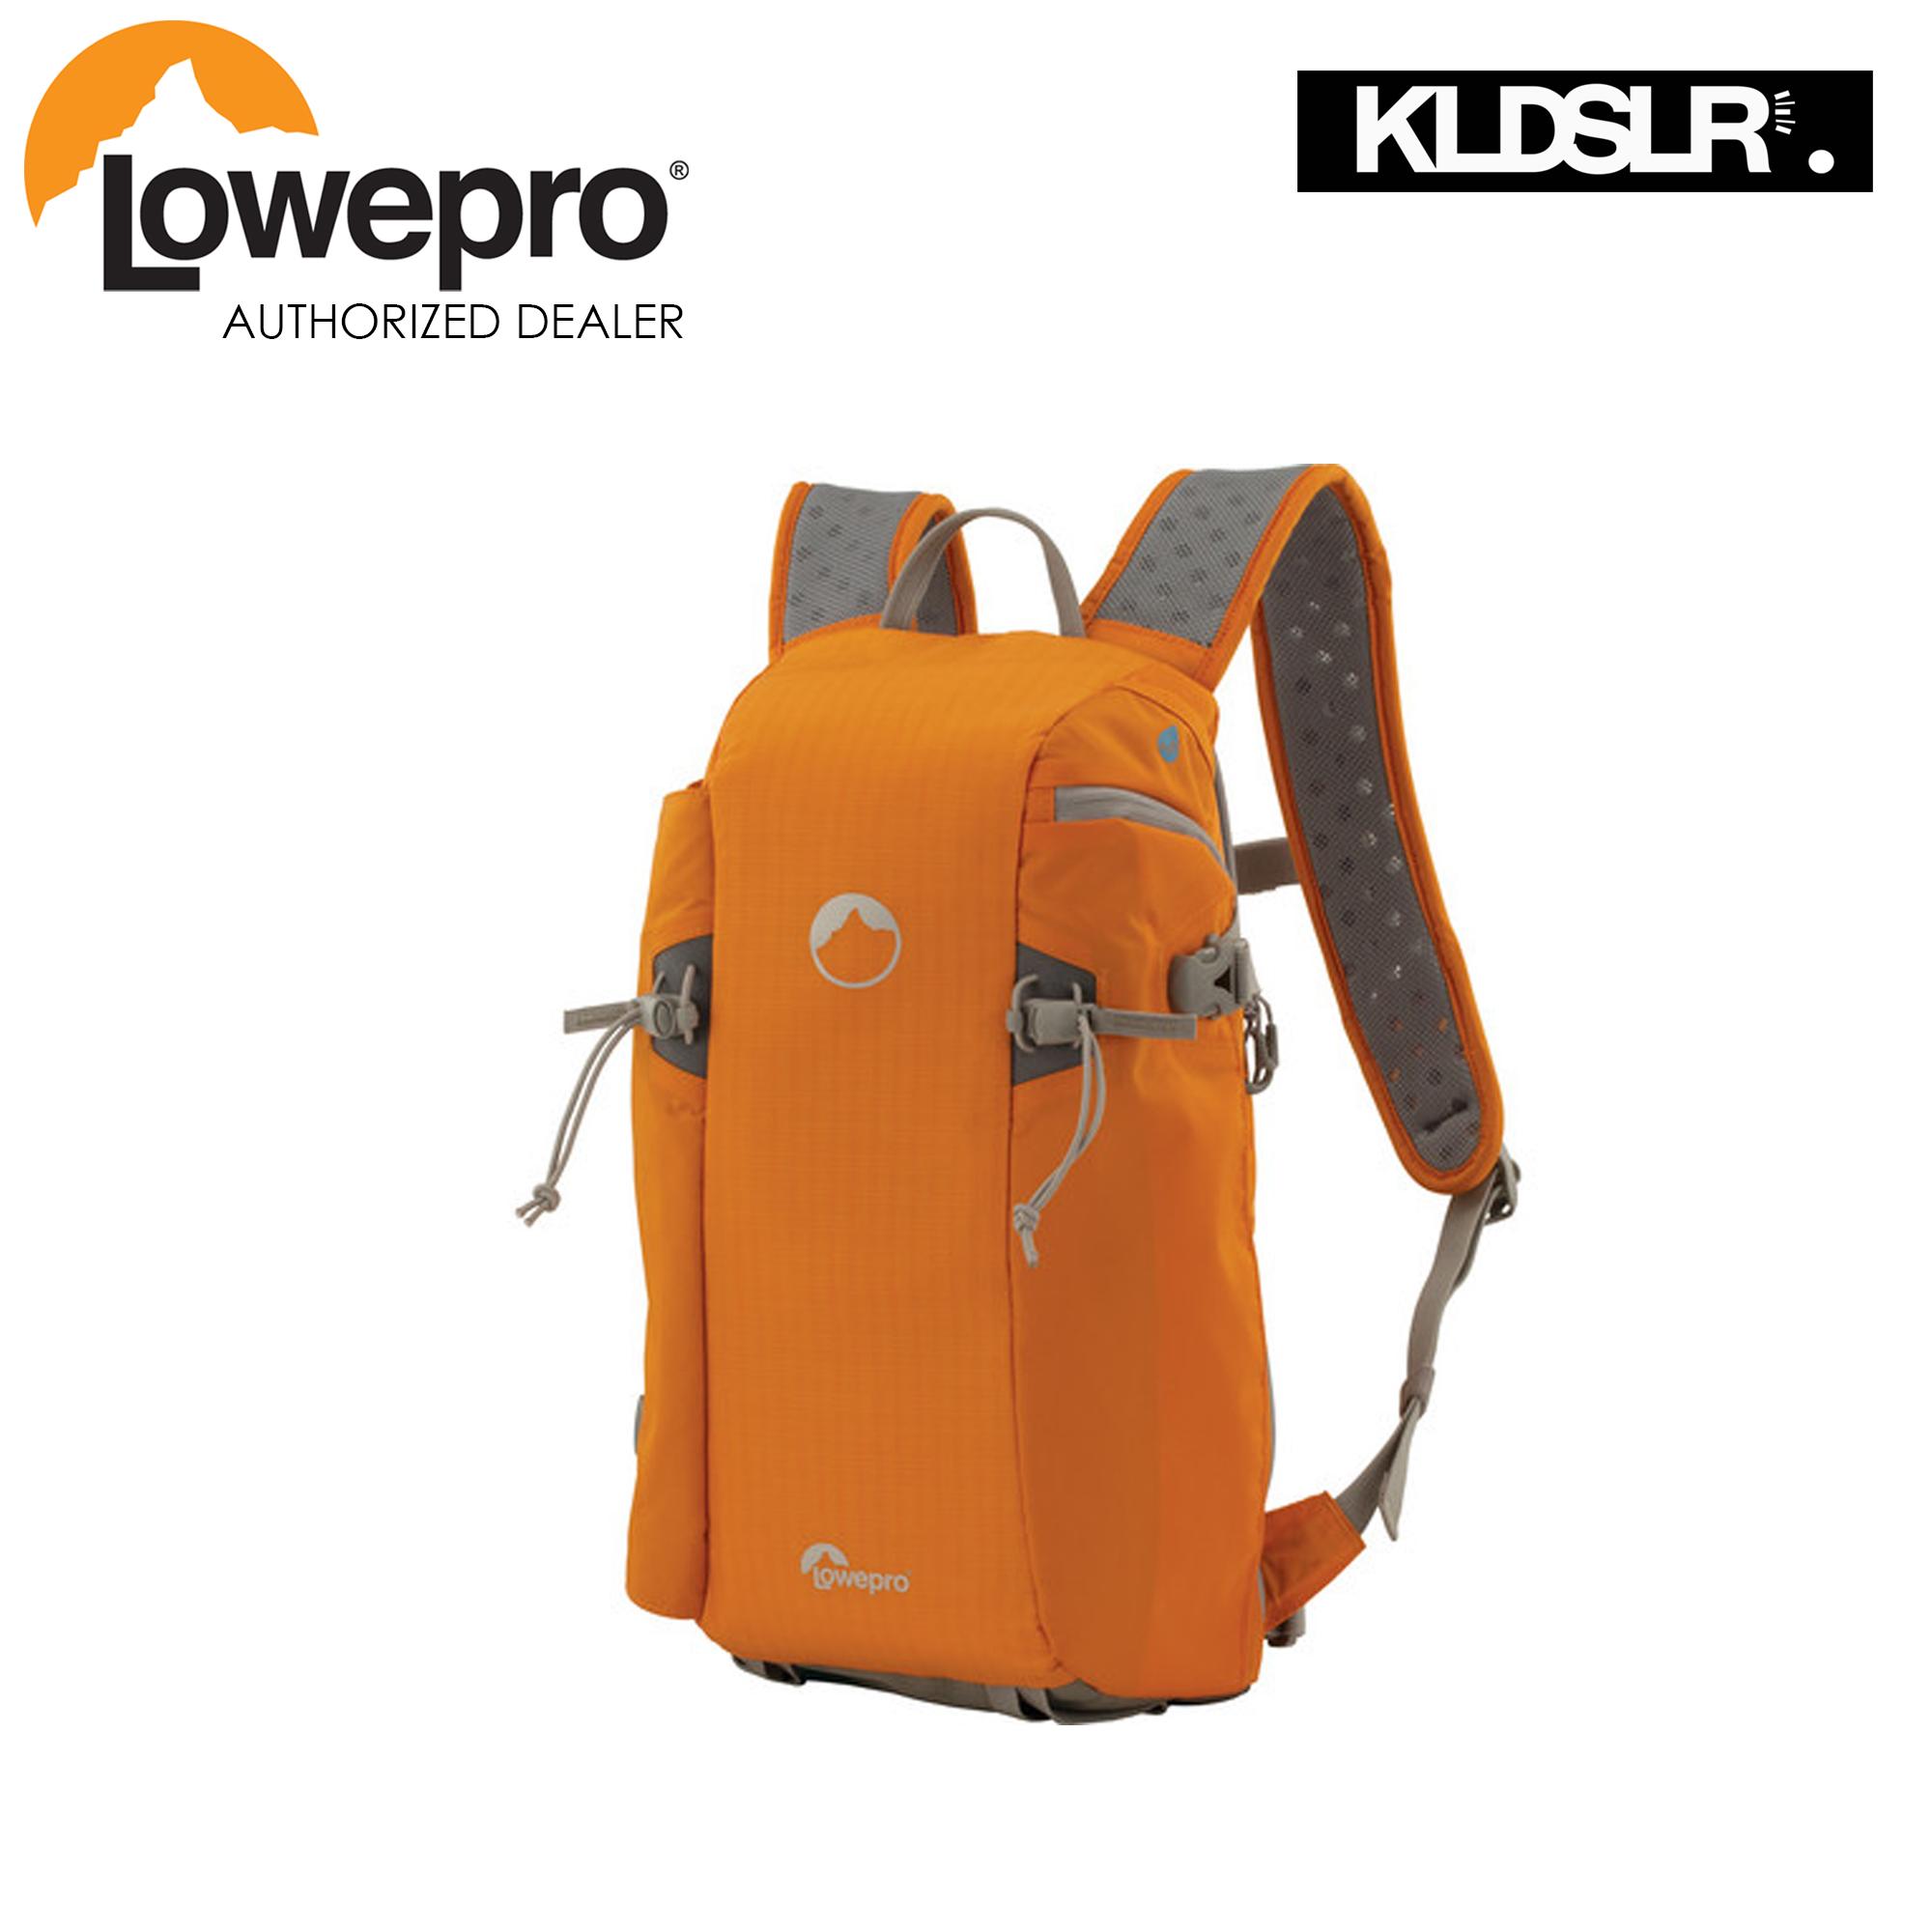 Lowepro Flipside Sport 10l Aw Daypack Orange Light Gray Protactic Sh 120 Black